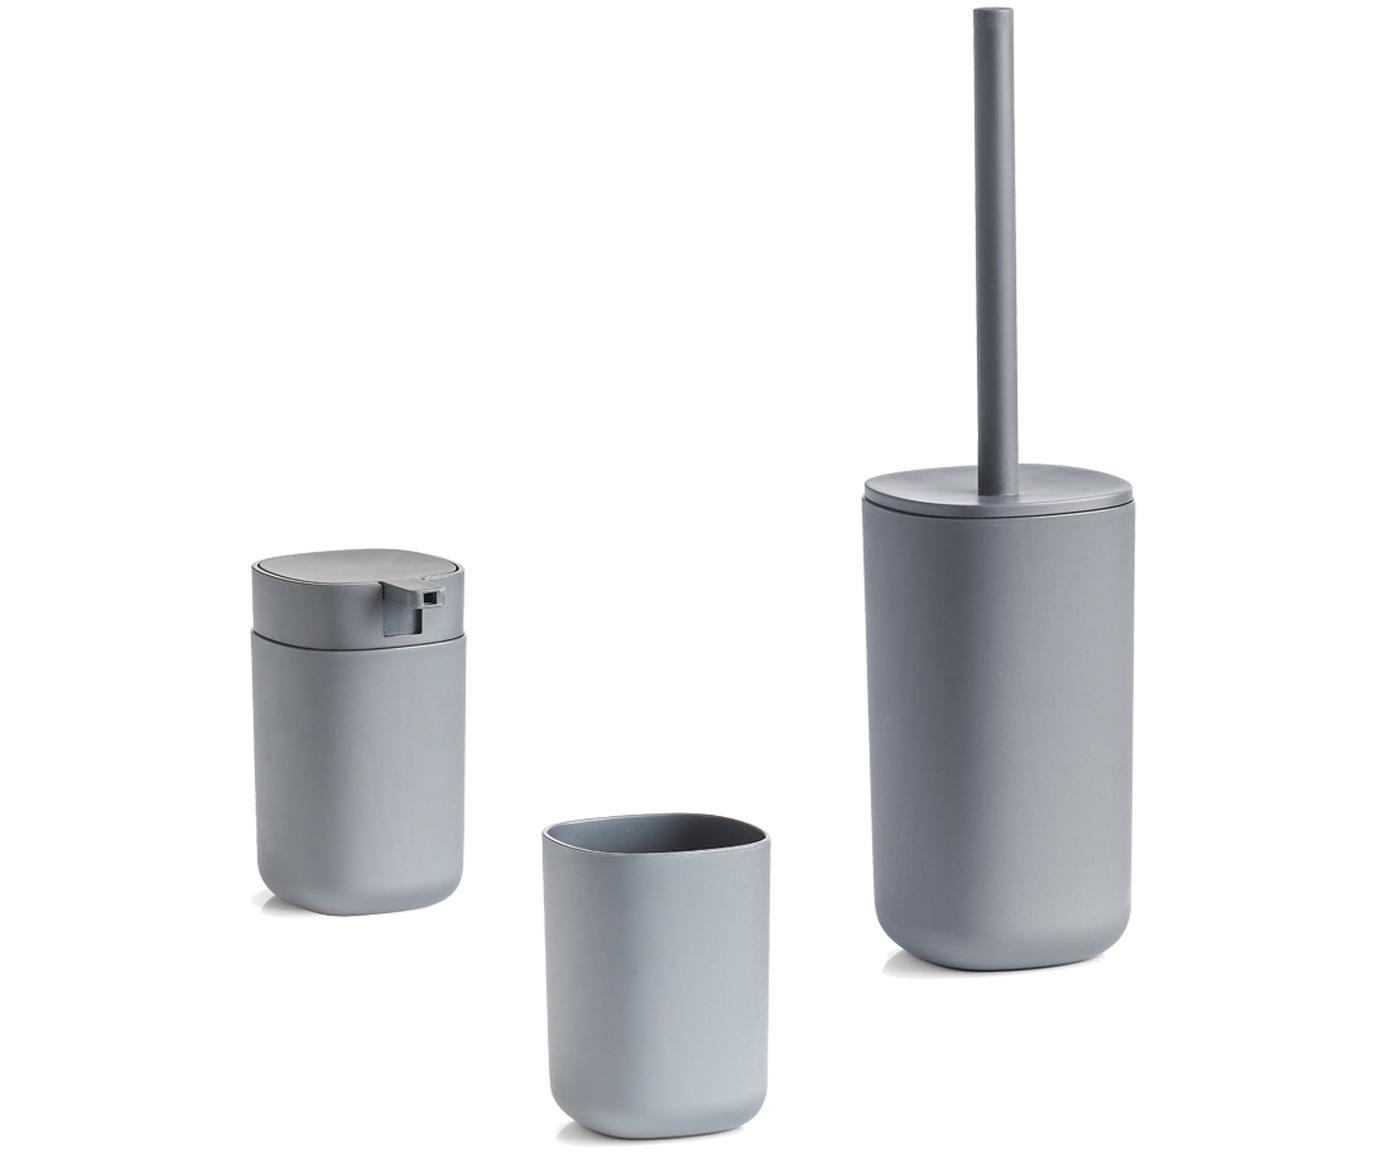 Toilettenbürste Yilma, Kunststoff, Grau, Ø 10 x H 36 cm